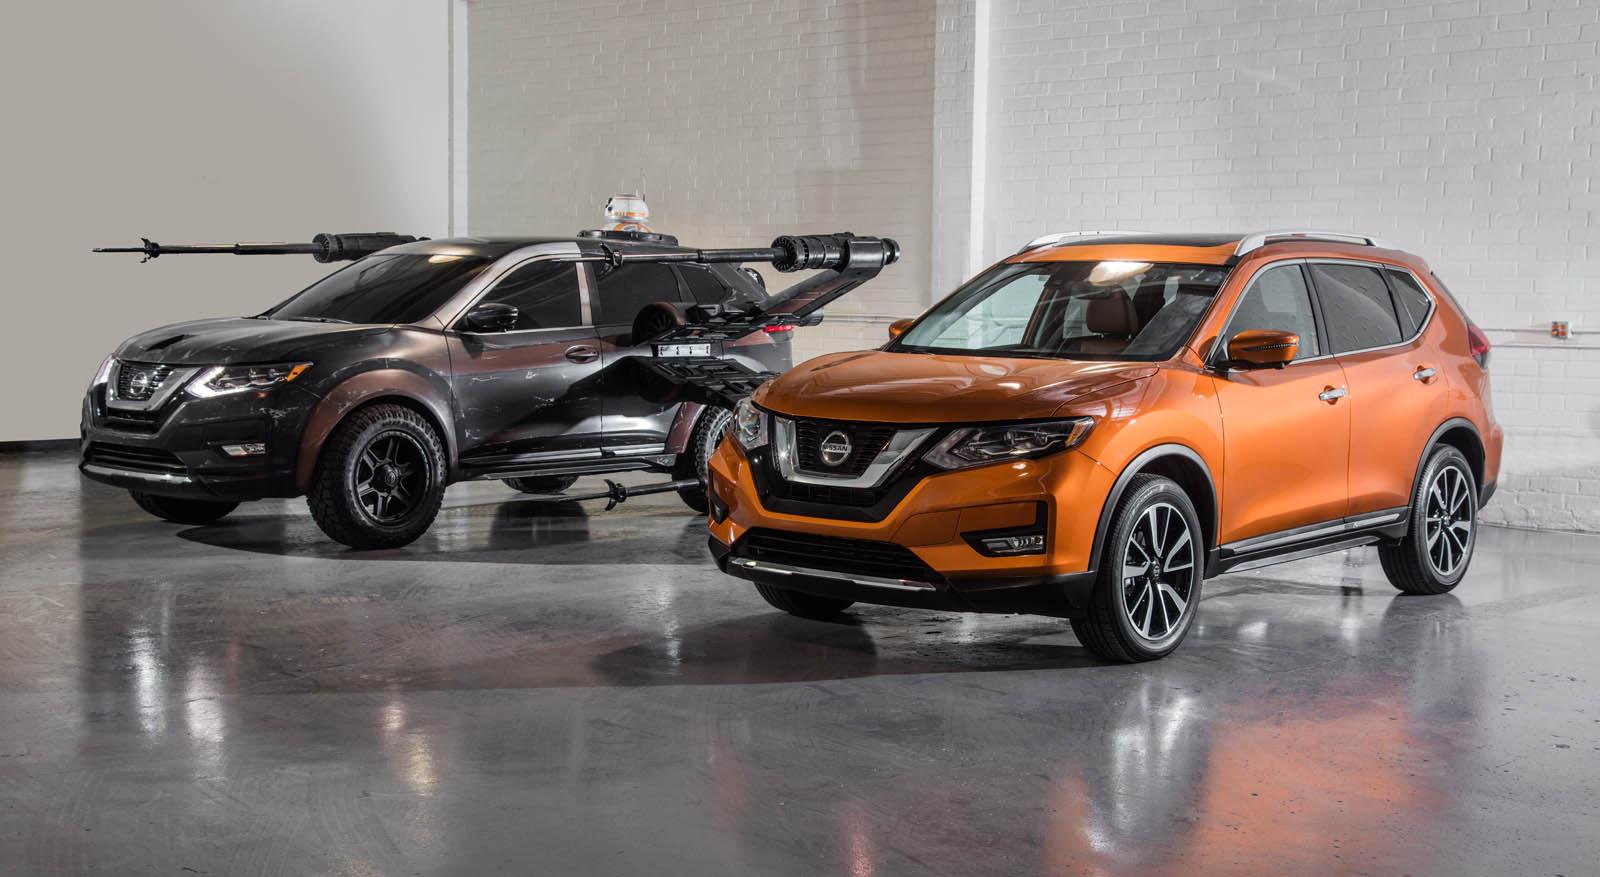 Nissan Gets Into The Star Wars Spirit With Six 'Last Jedi